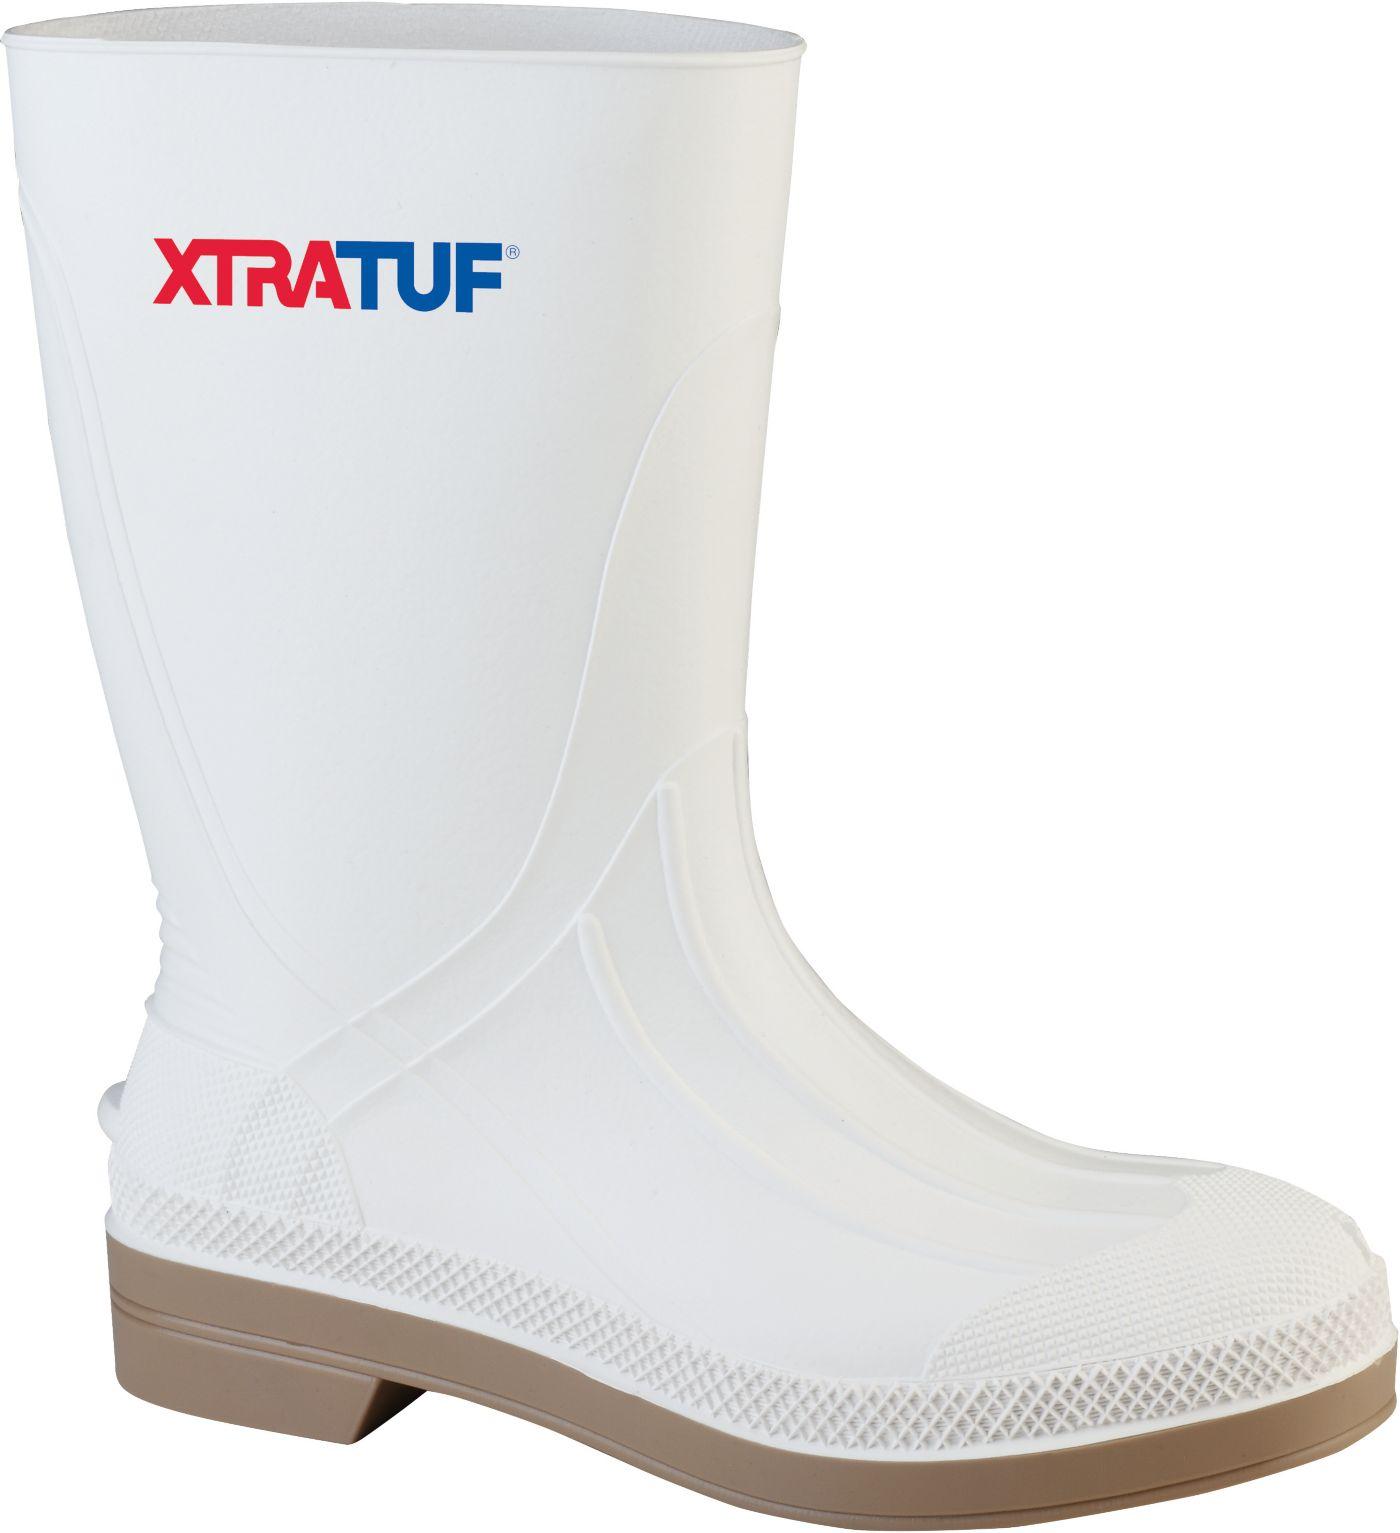 XTRATUF Men's 11'' Insulated Shrimp Boots